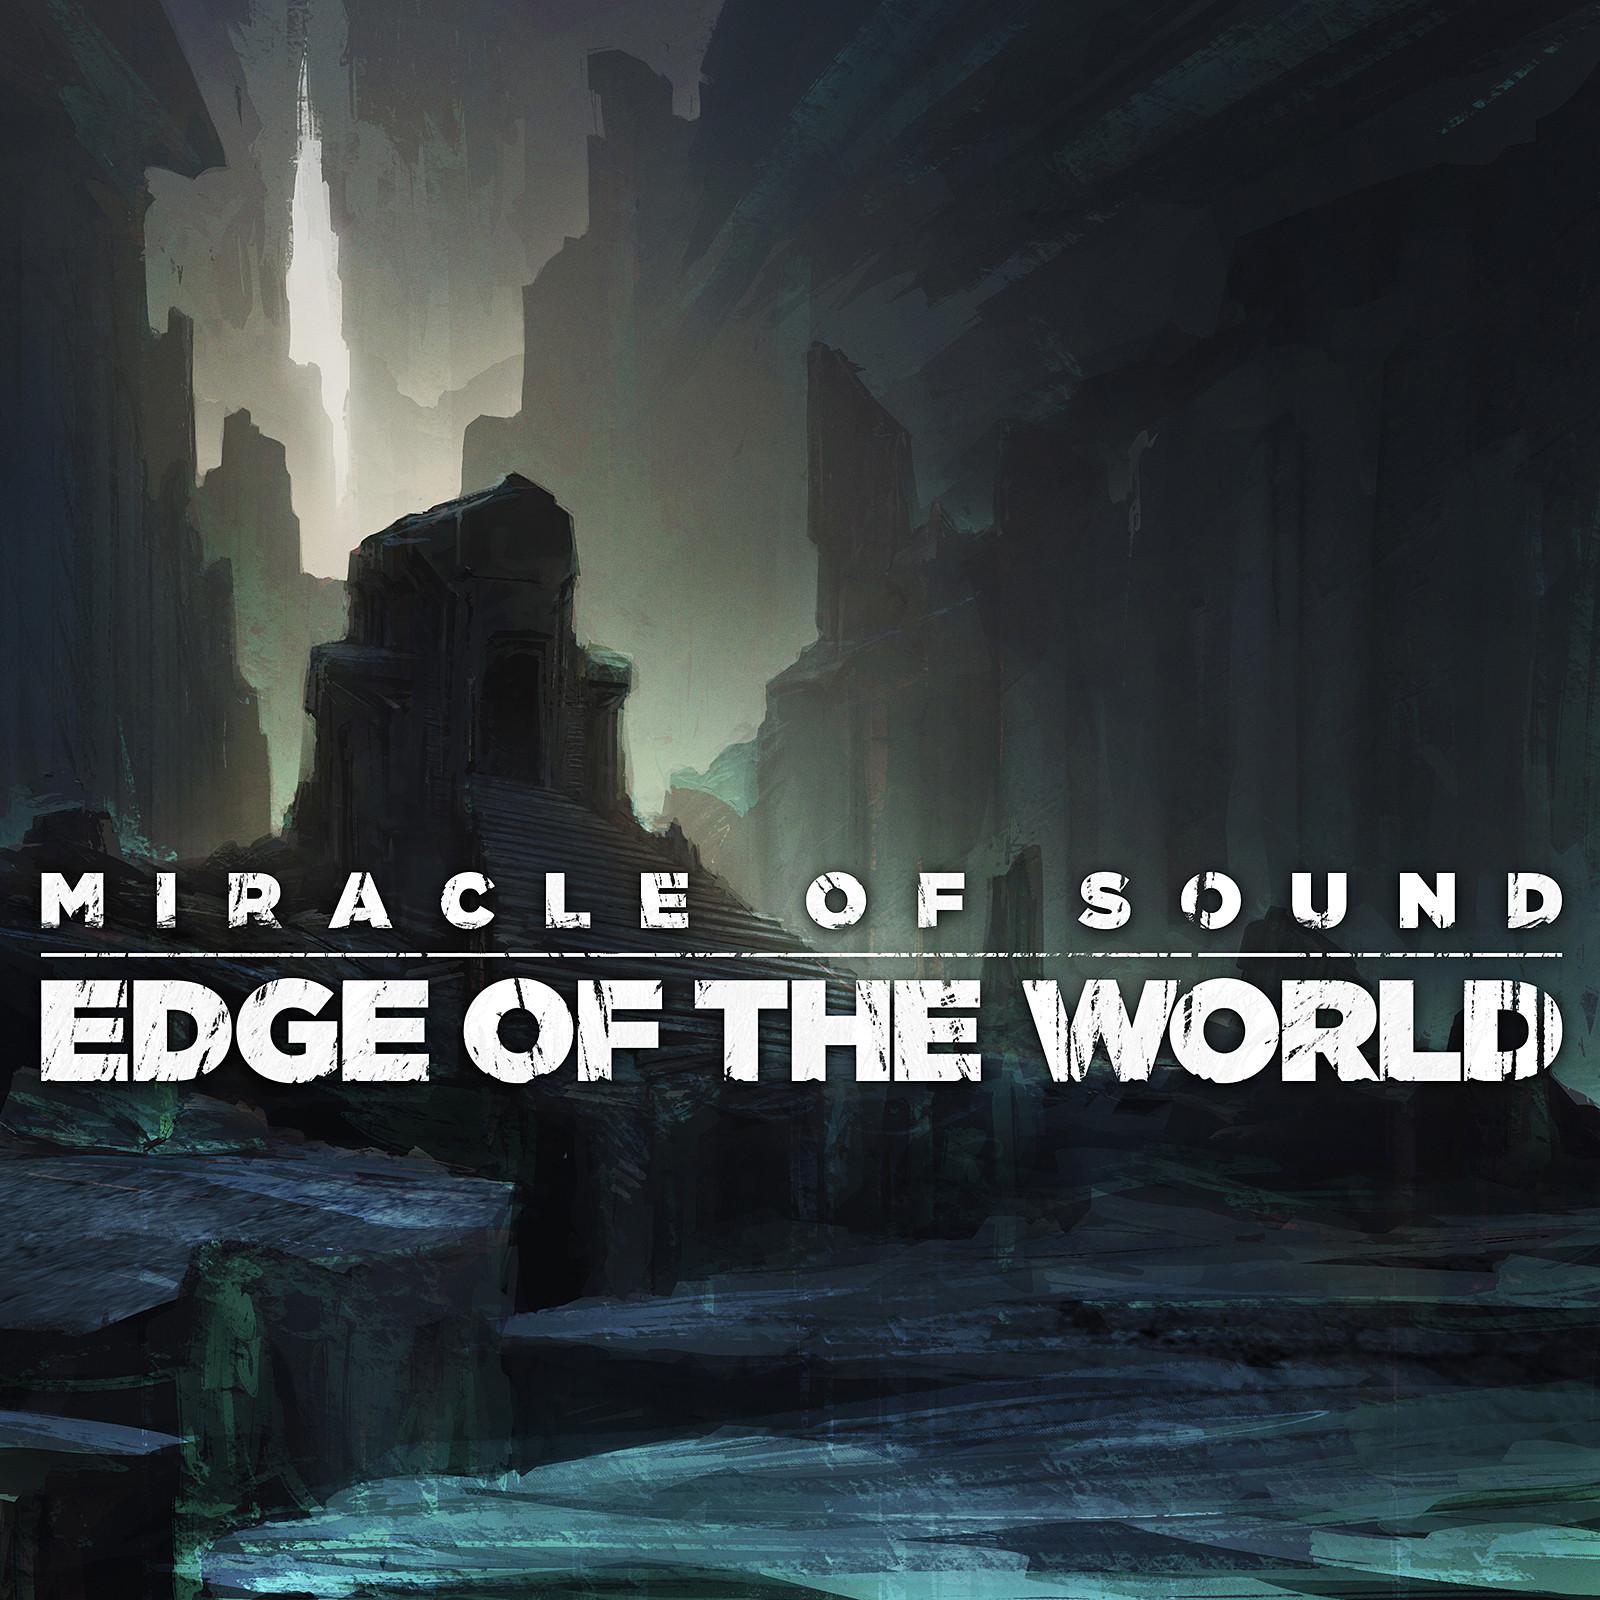 Alfred khamidullin edgeoftheworld10